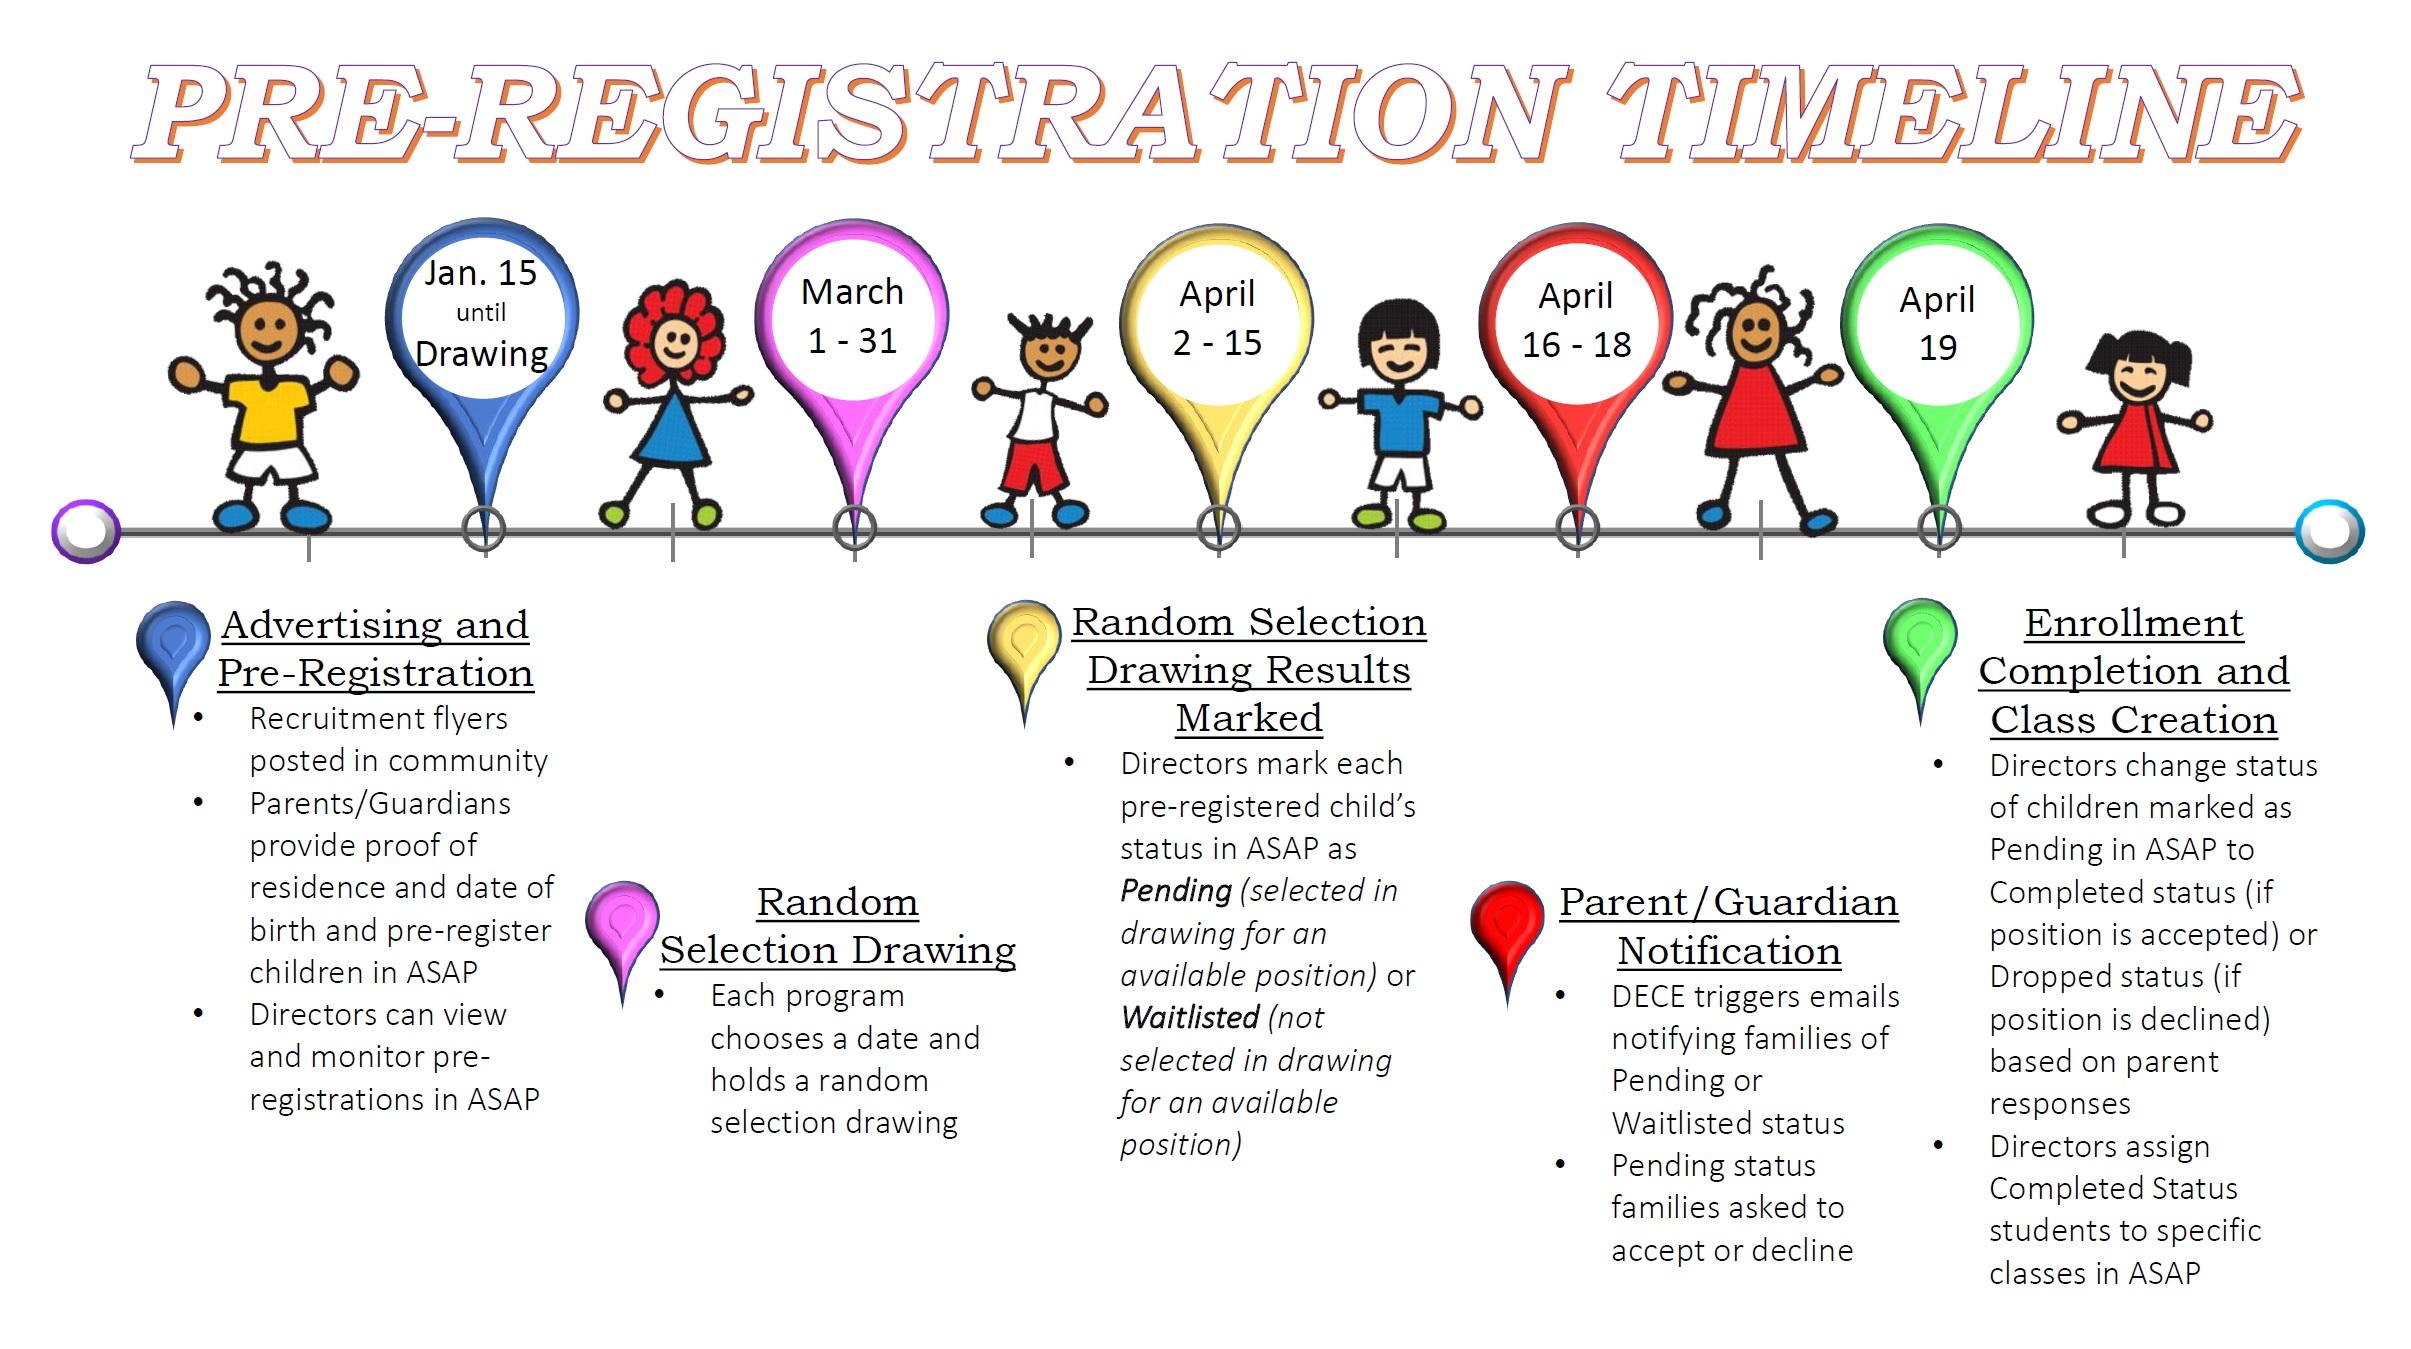 Timeline illustration provided by the Alabama First Class pre-K program.